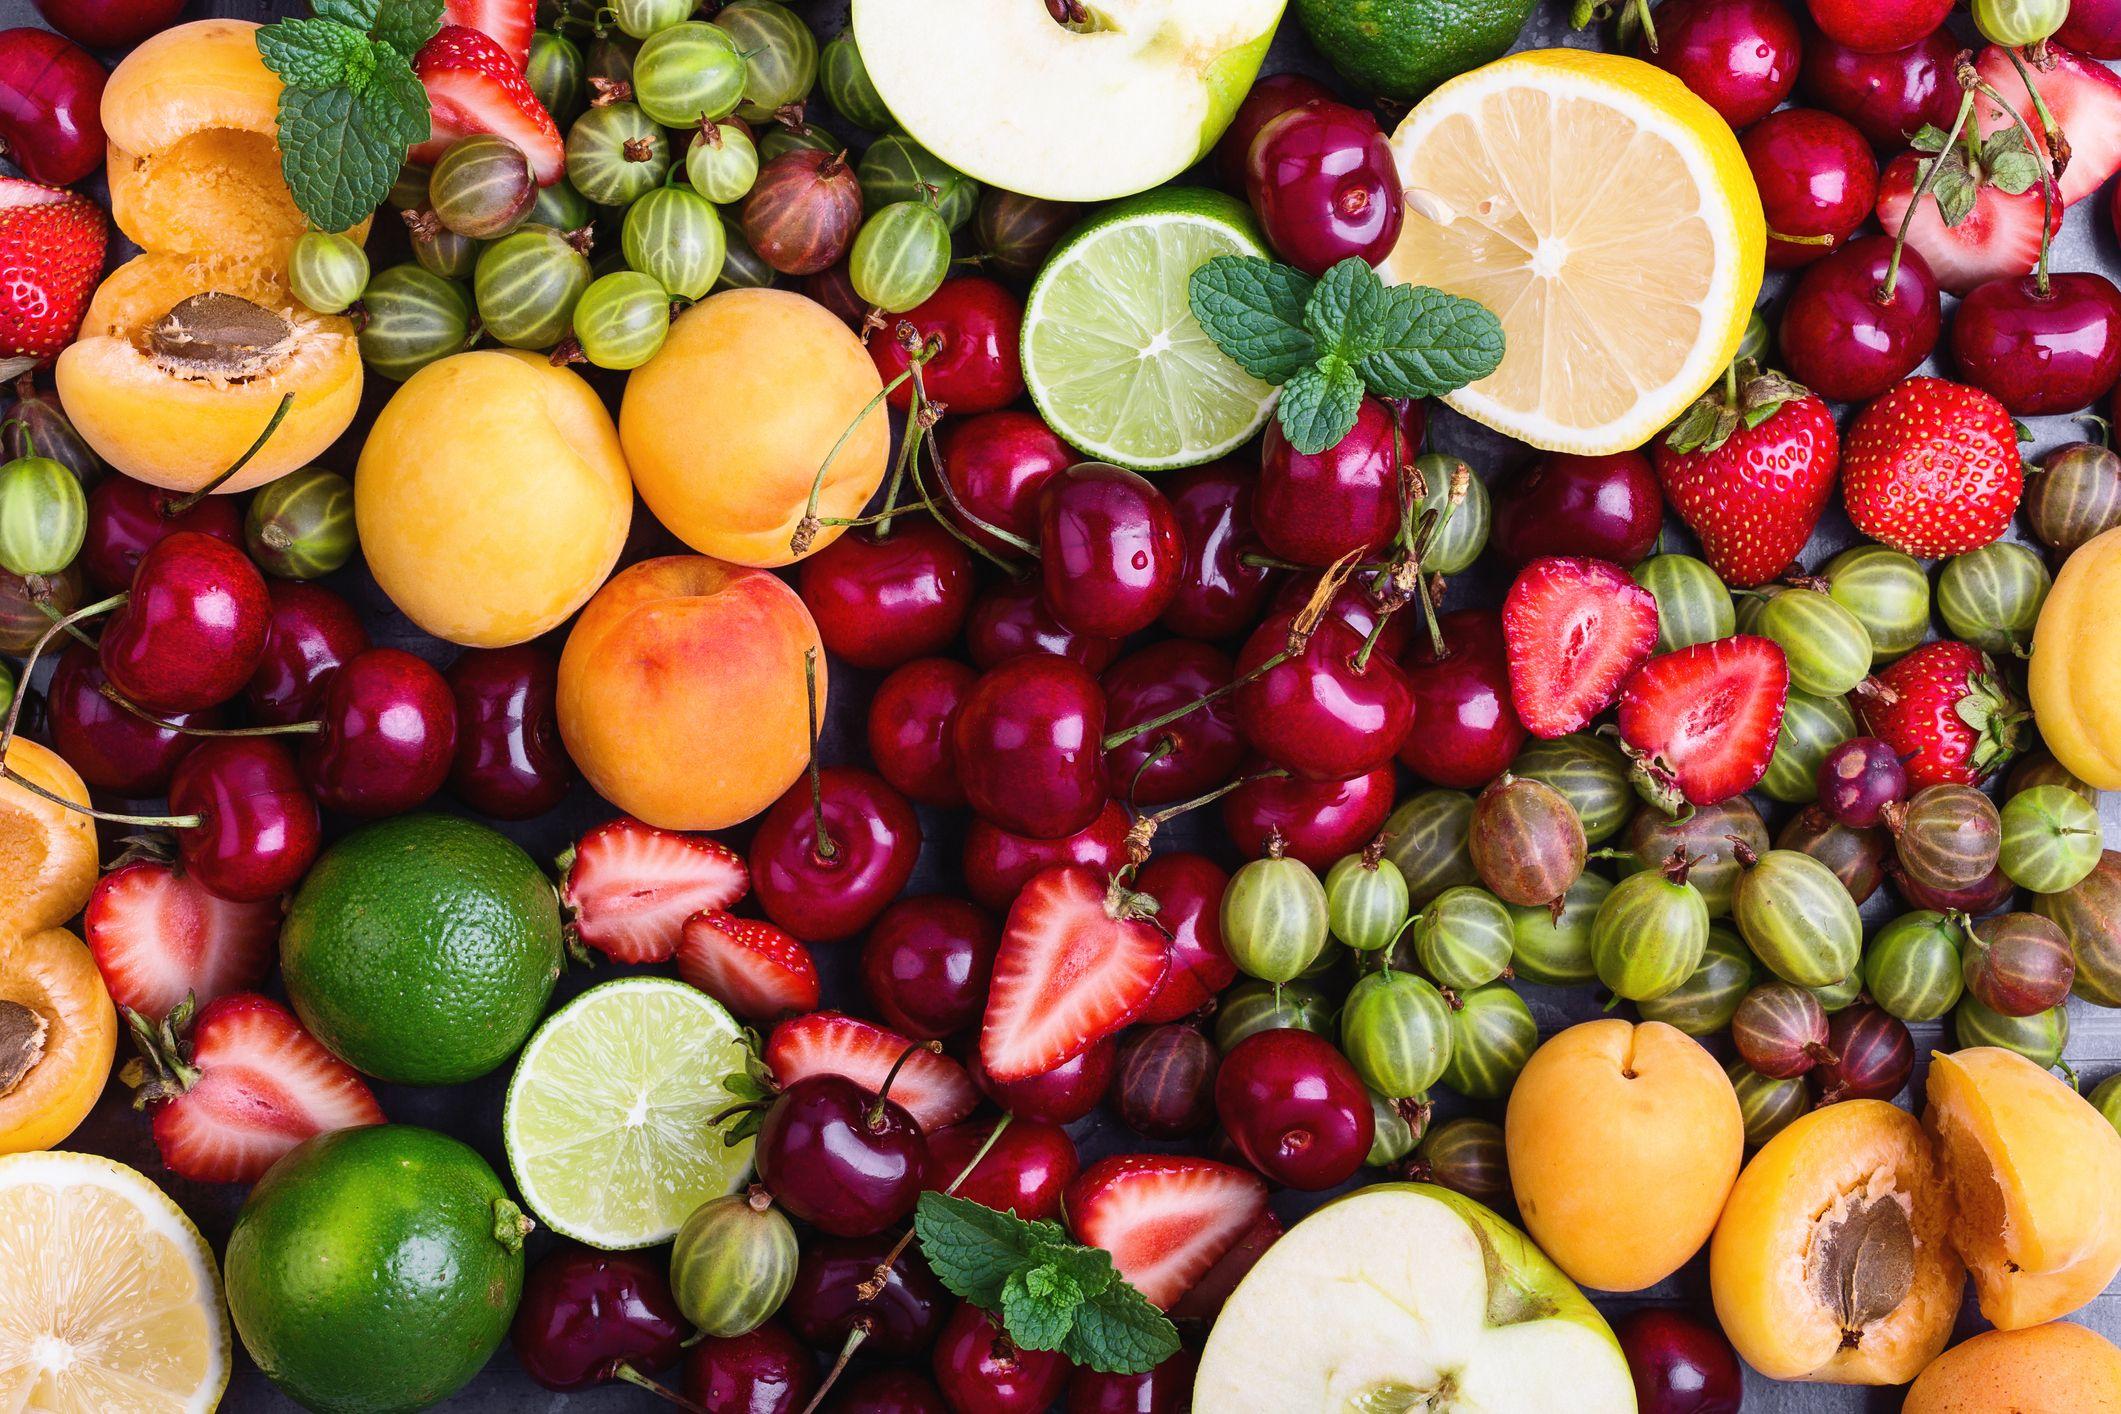 Colorful Fruit Bin